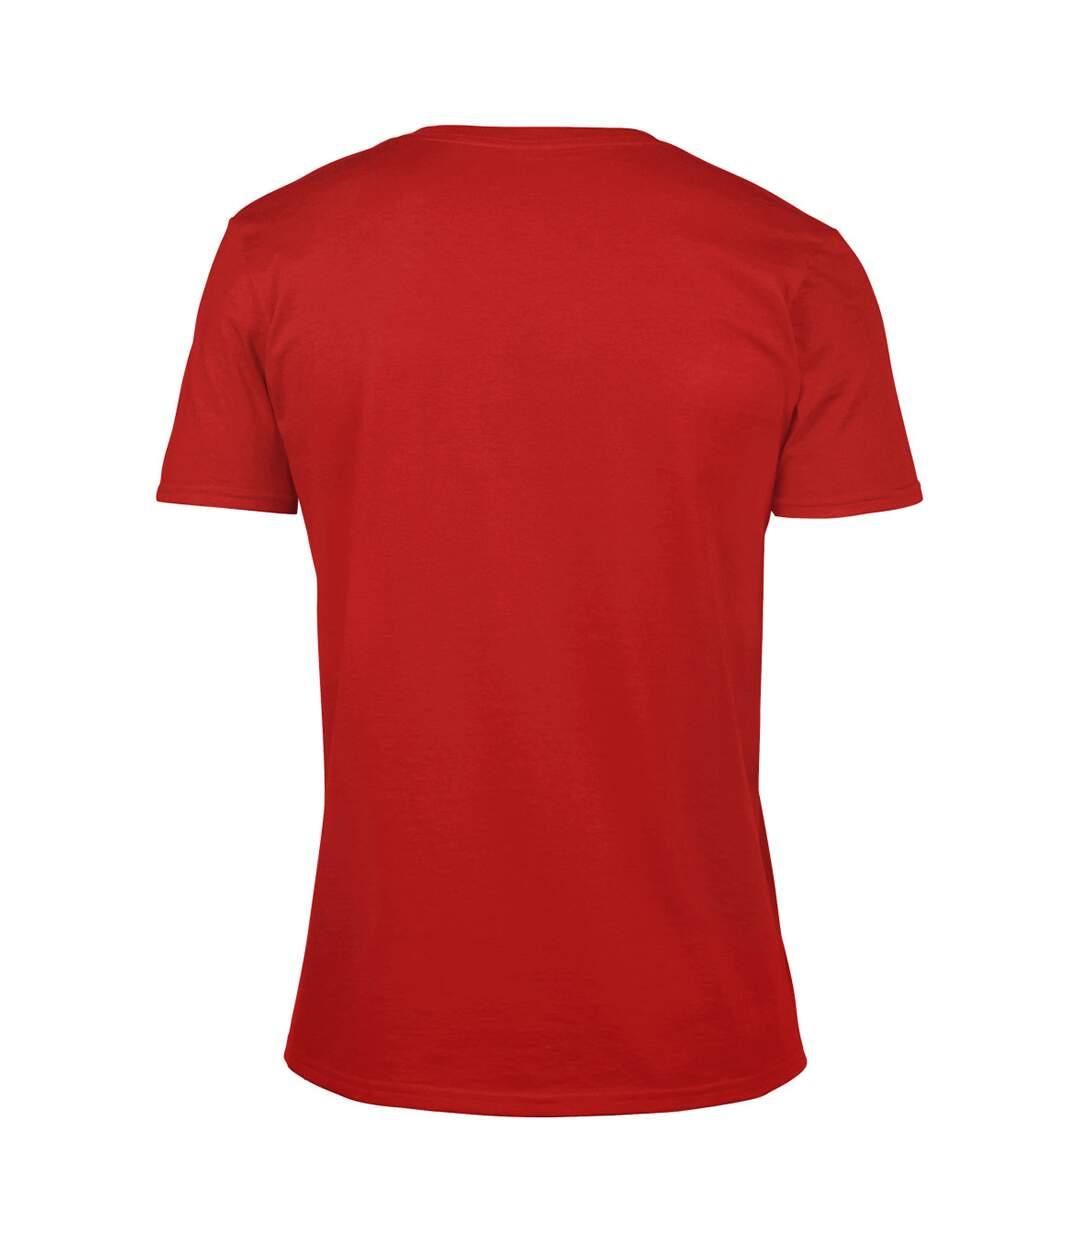 Gildan Mens Soft Style V-Neck Short Sleeve T-Shirt (Red) - UTBC490